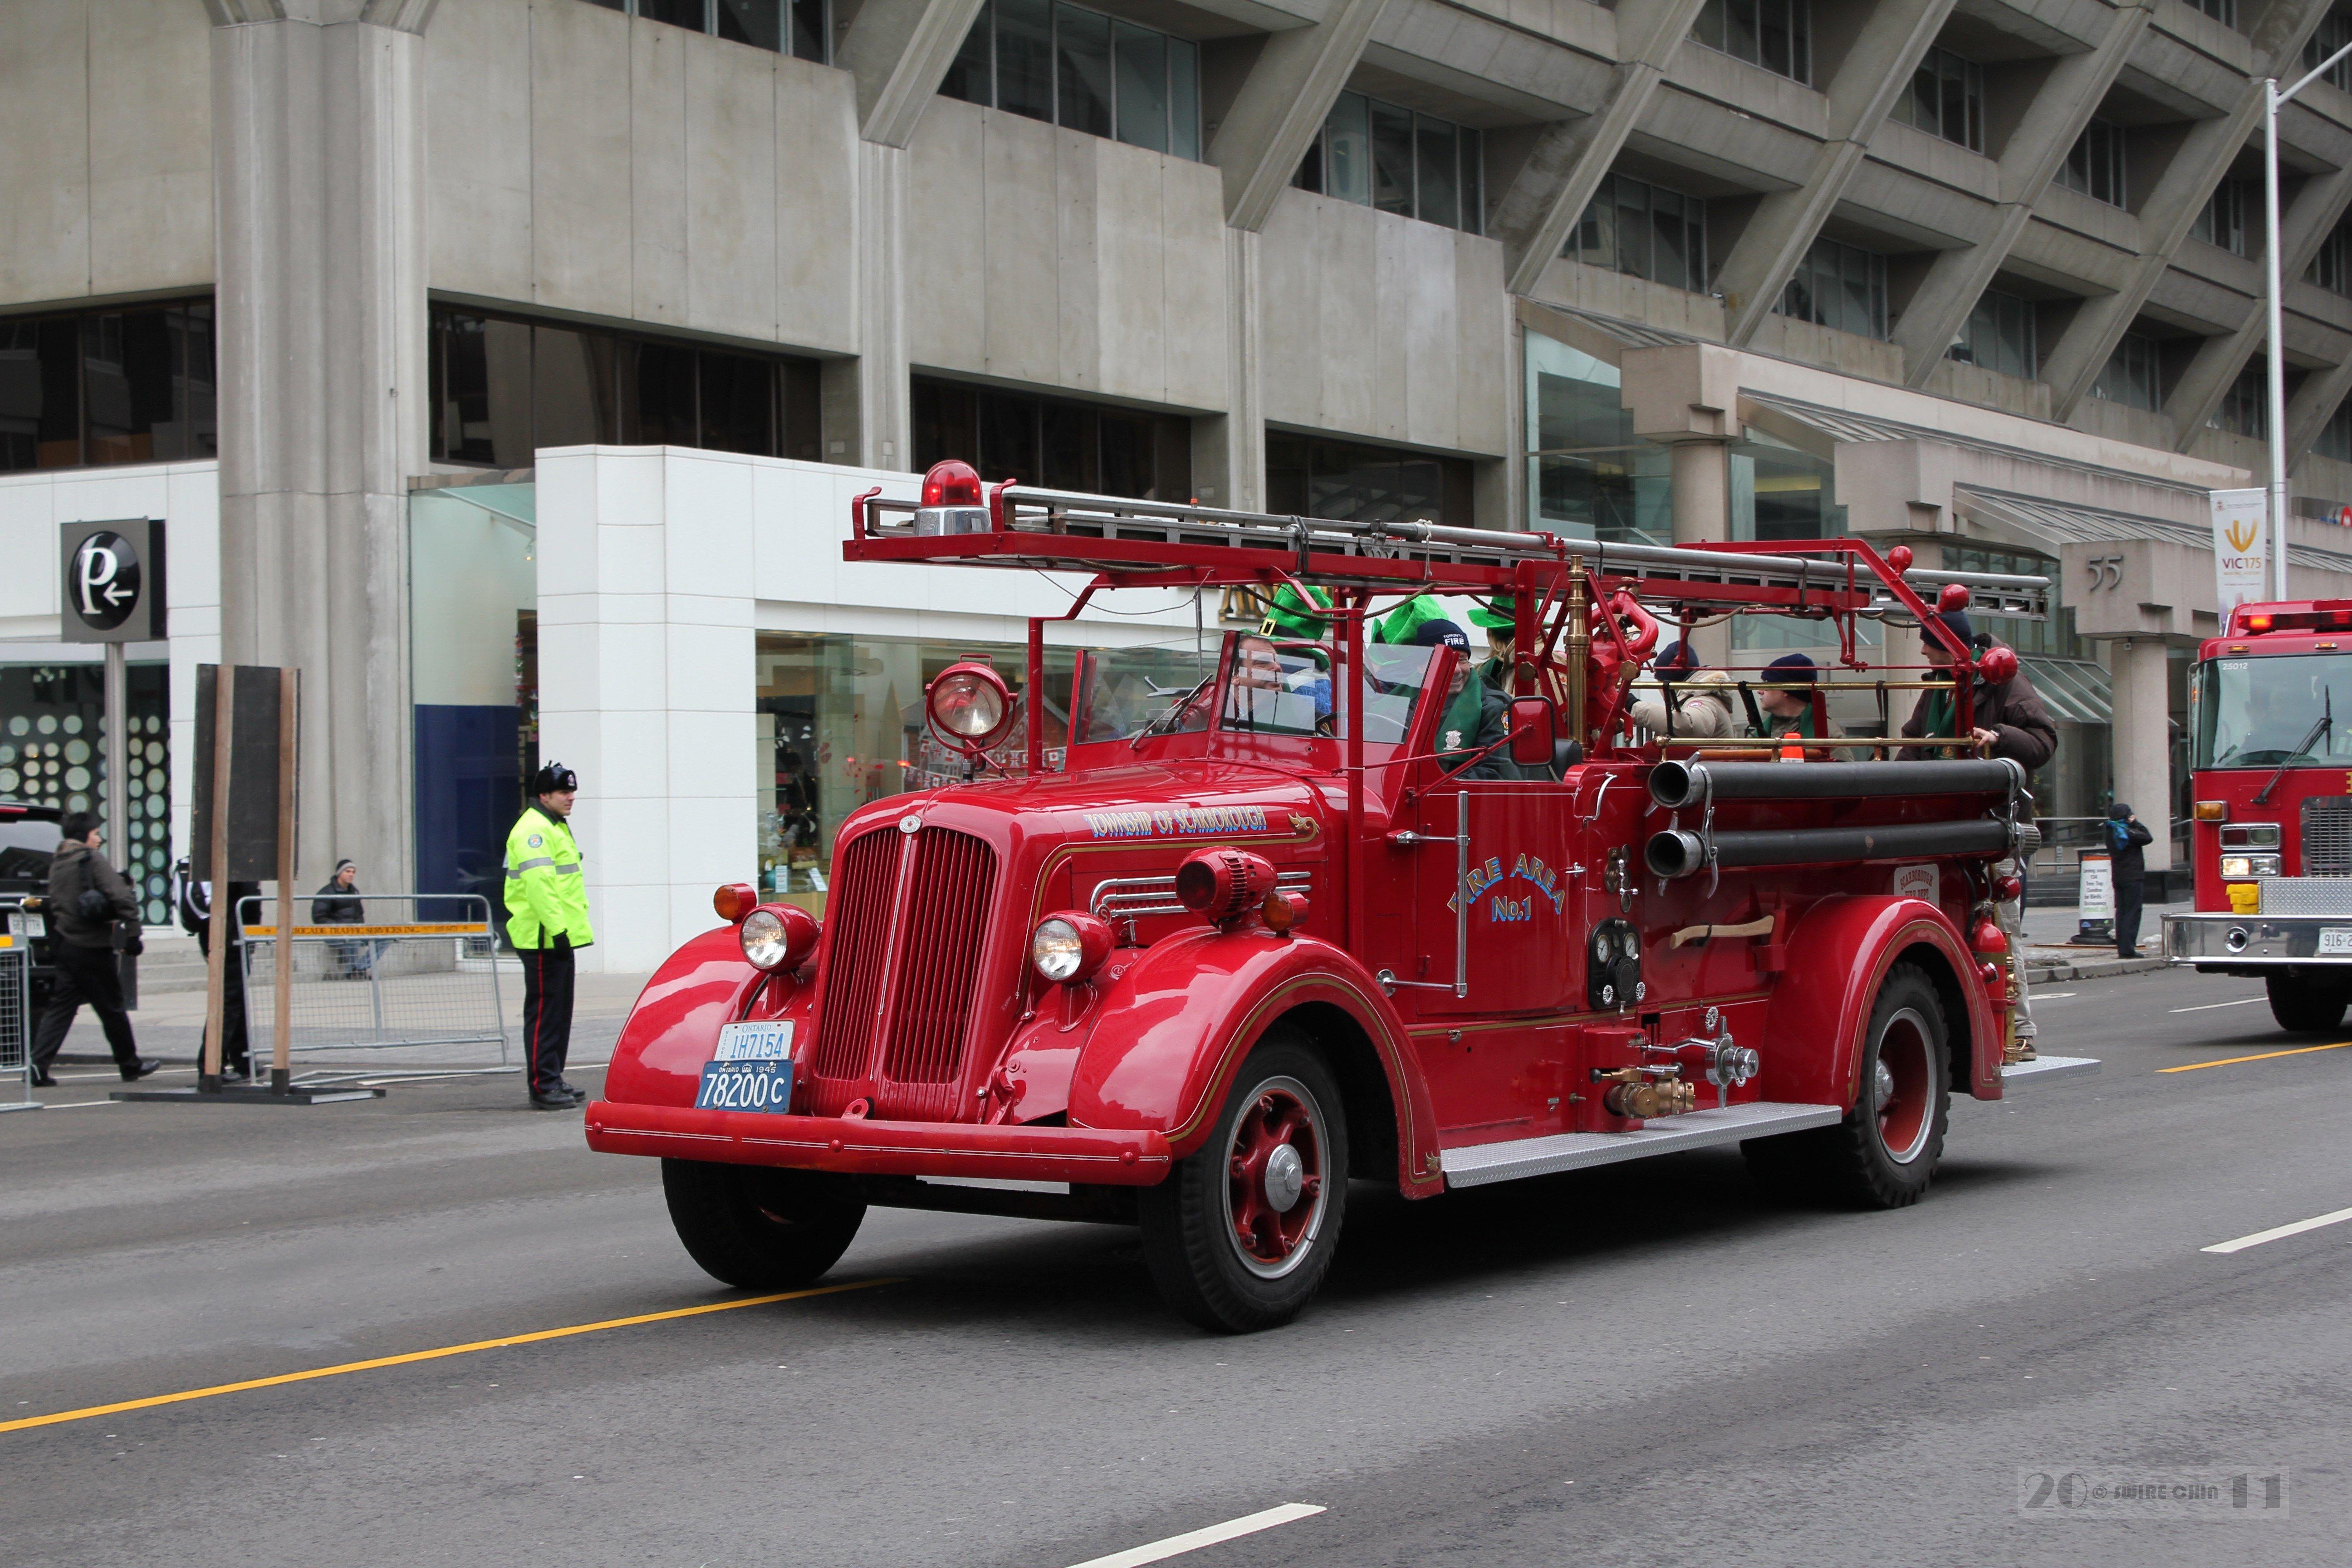 5184x3456 Free Download Pictures Of Fire Truck Fire Trucks Fire Truck Videos Trucks